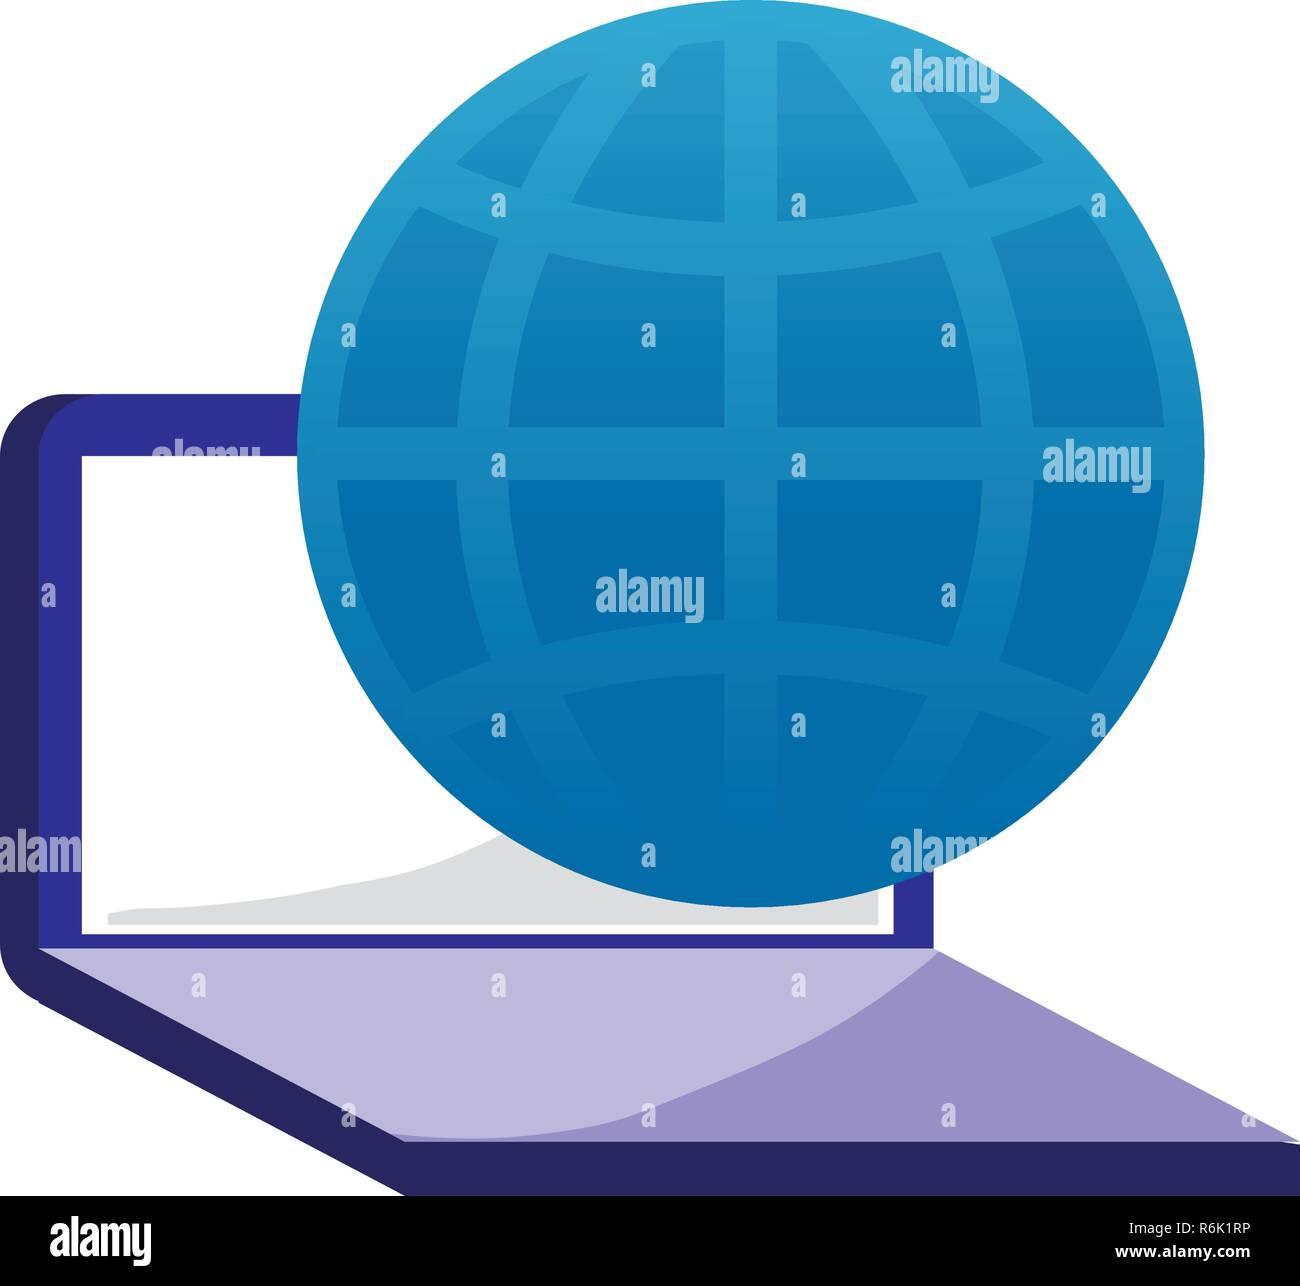 laptop computer world digital technology vector illustration - Stock Image